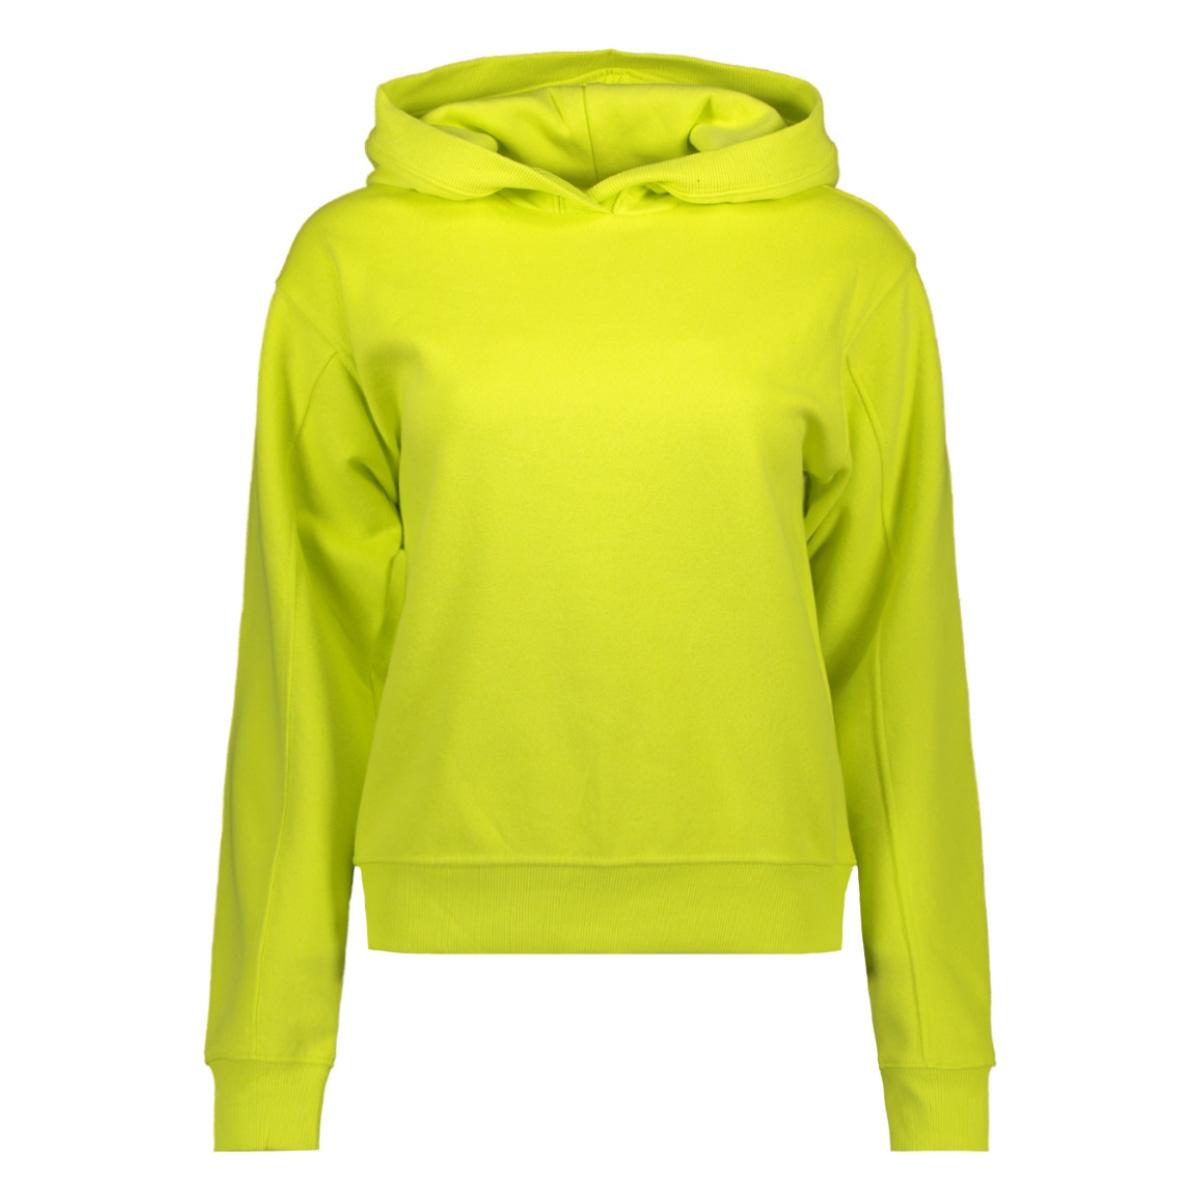 onlhilde l/s hood swt 15195619 only sweater limeade